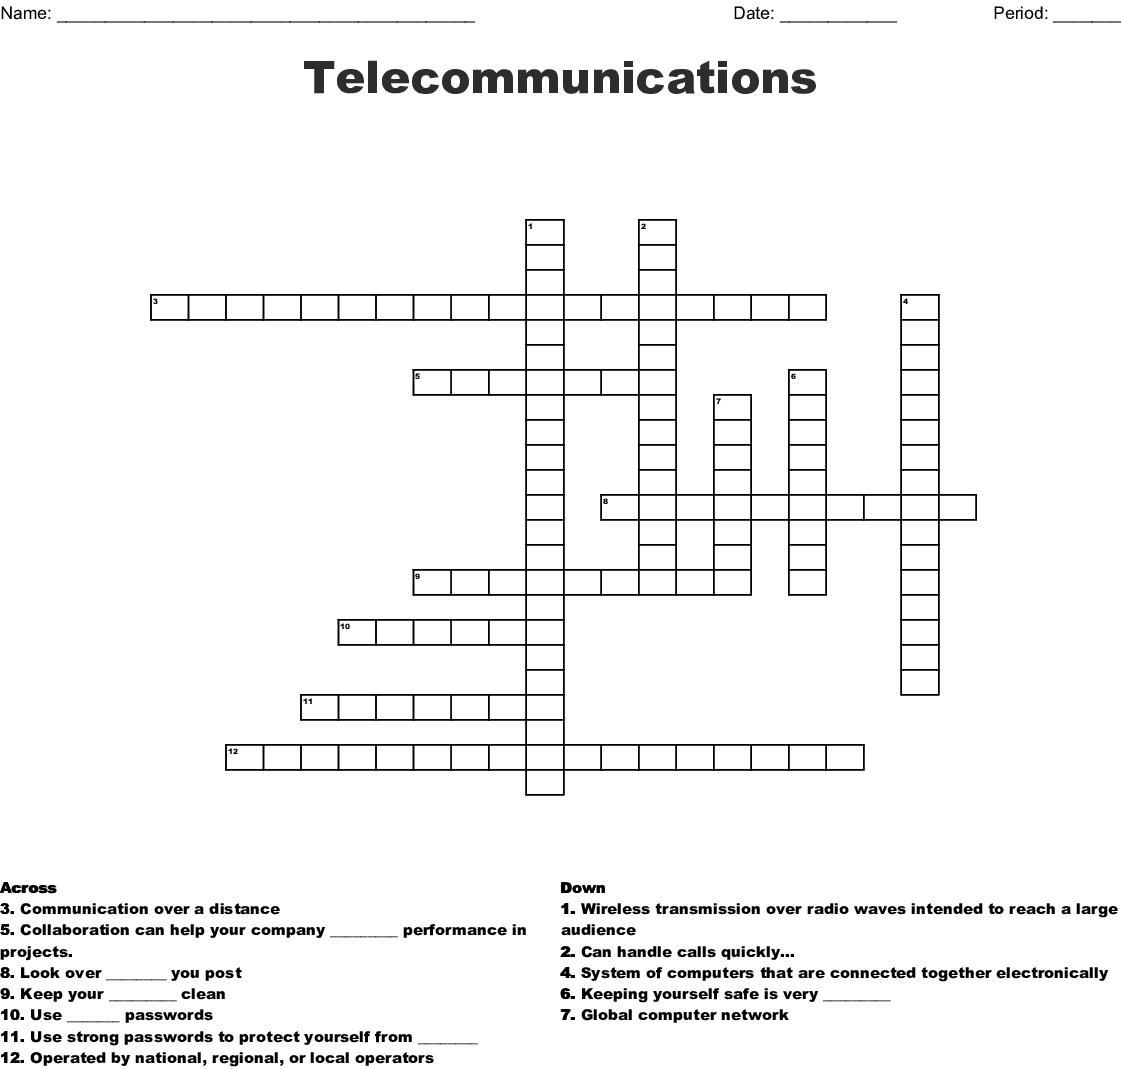 Internet Amp Telecom Crosswords Word Searches Bingo Cards